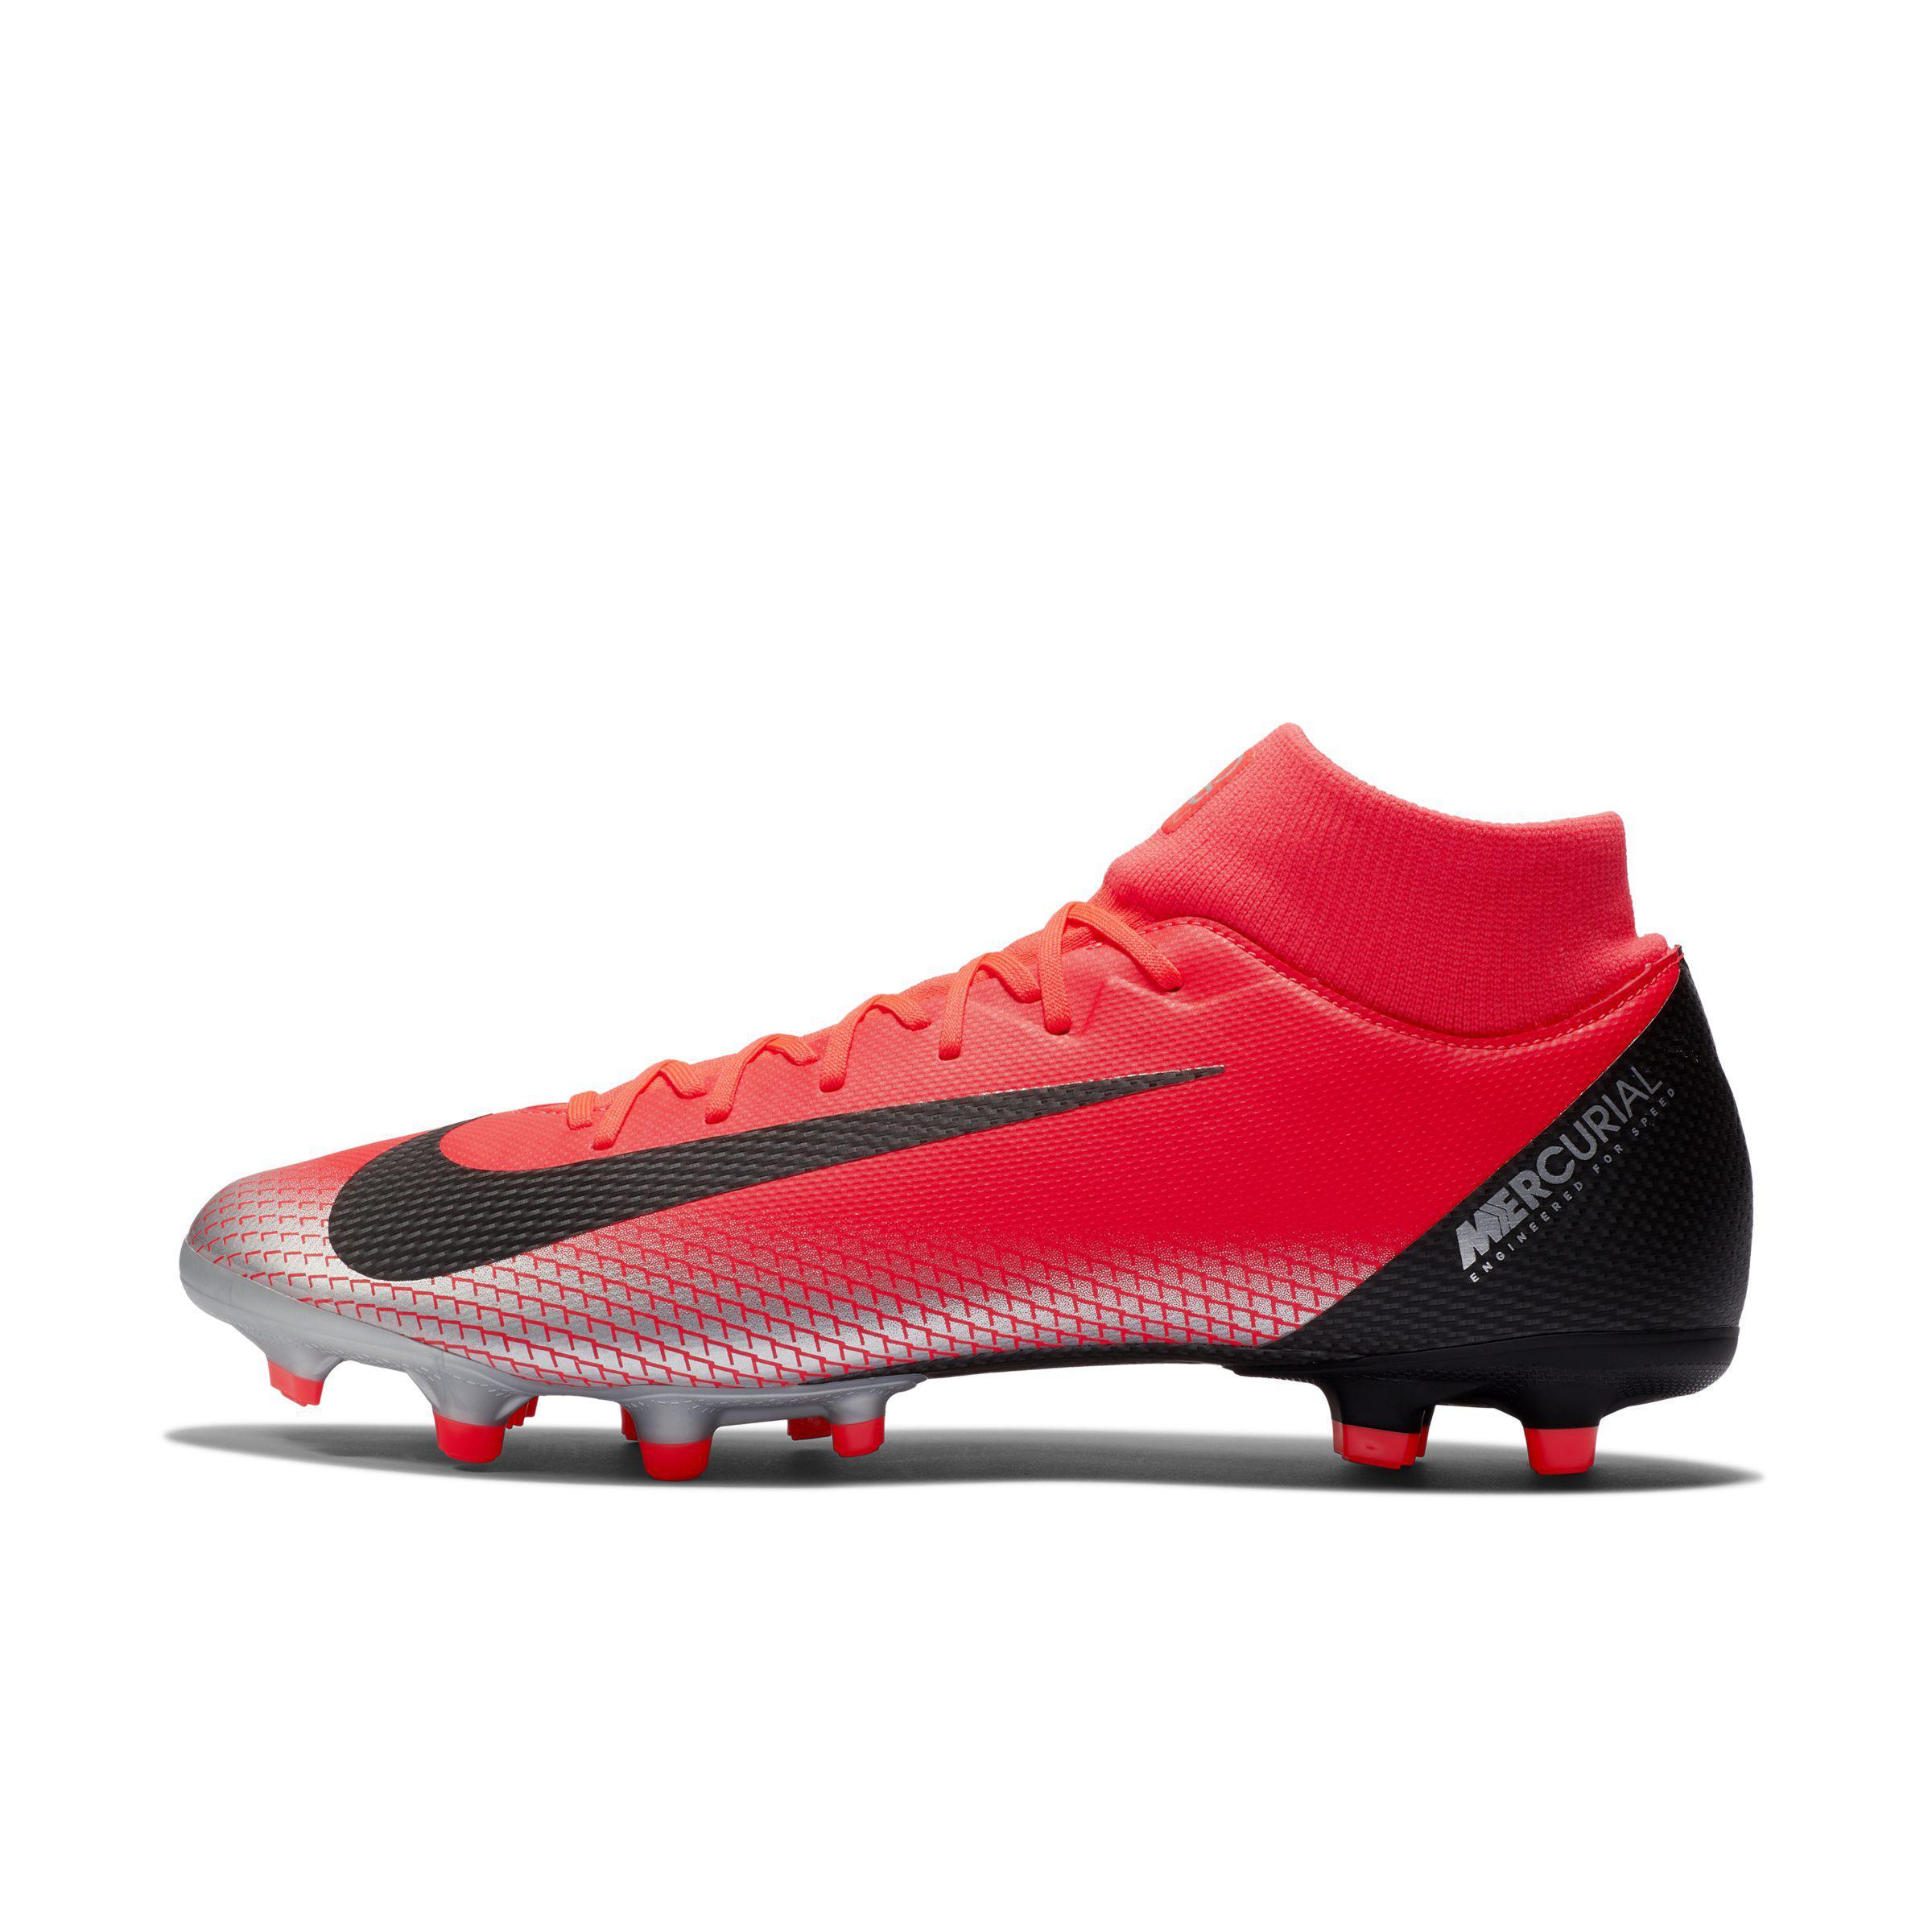 5cb2c5182 Nike Mercurial Superfly 6 Academy Cr7 Mg Multi-ground Football Boot ...